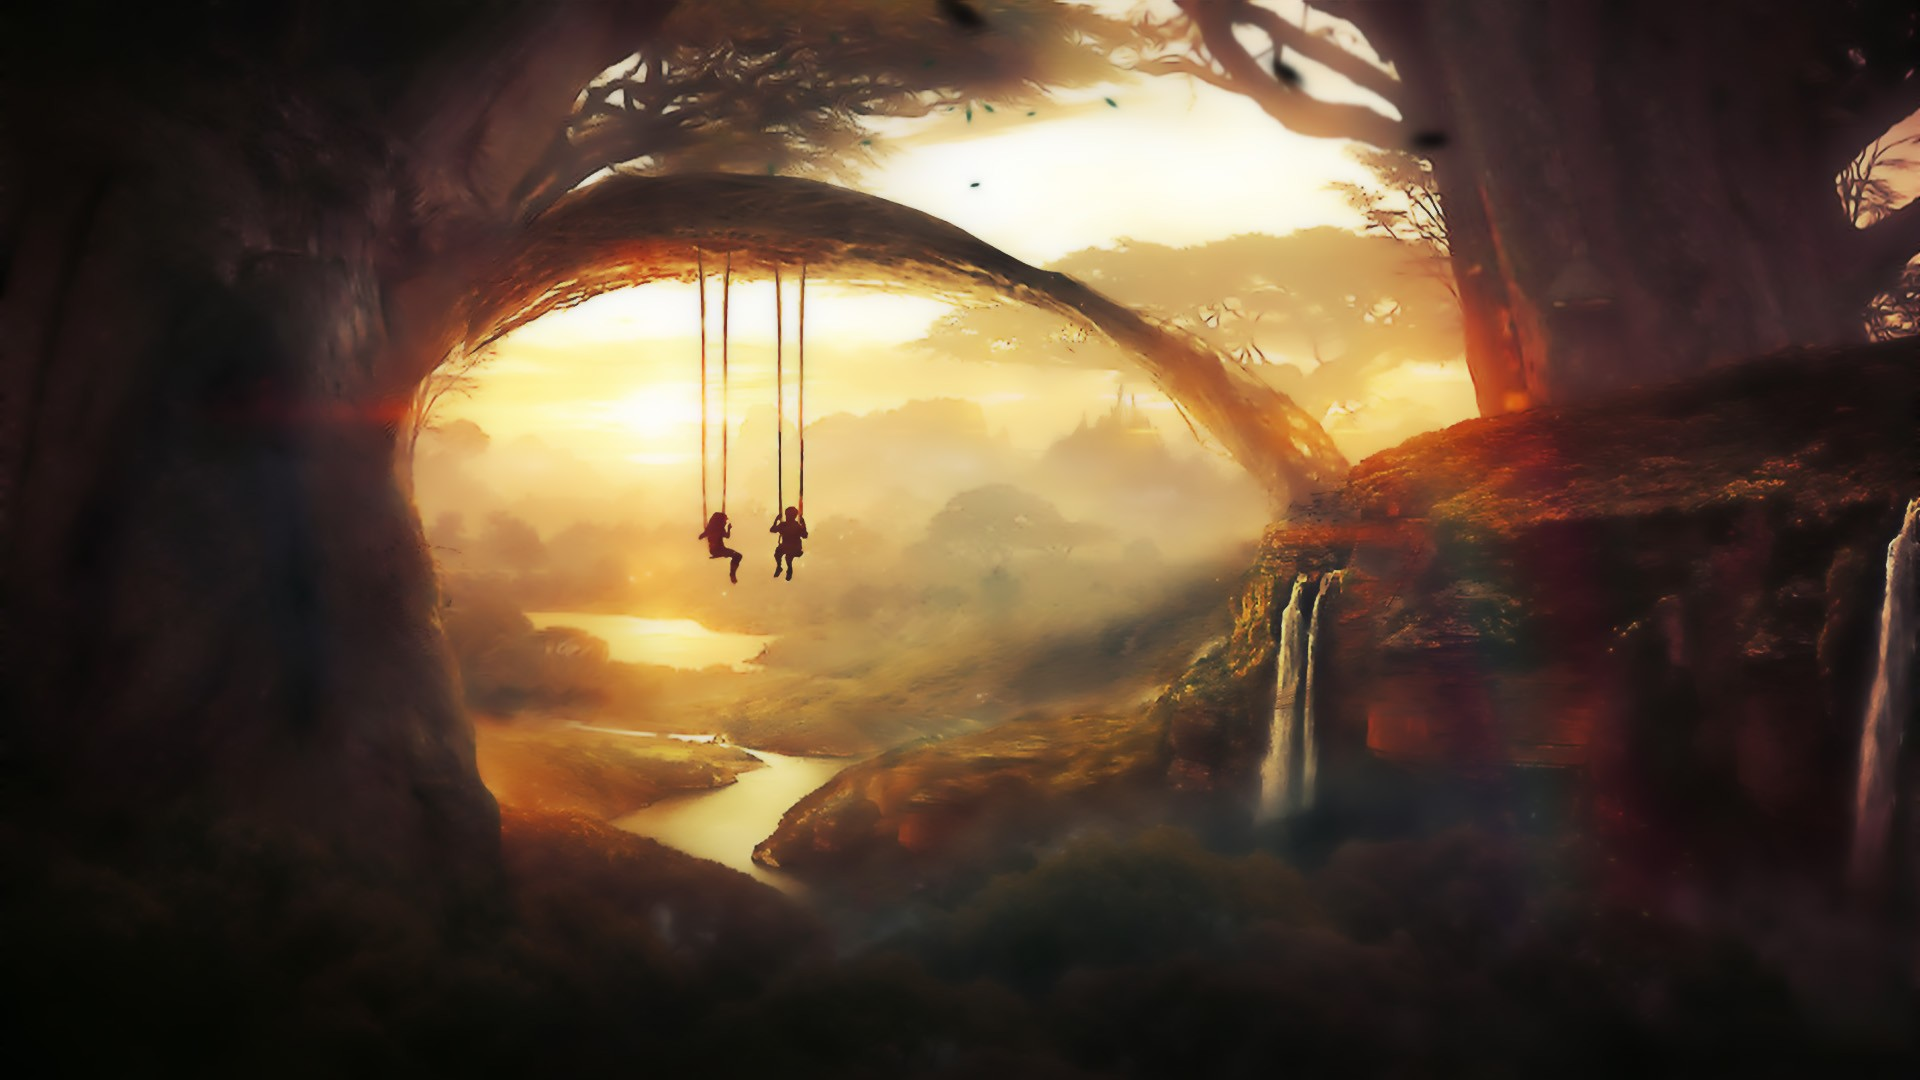 General 1920x1080 artwork fantasy art digital art forest nature painting swings children waterfall t1na DeviantArt